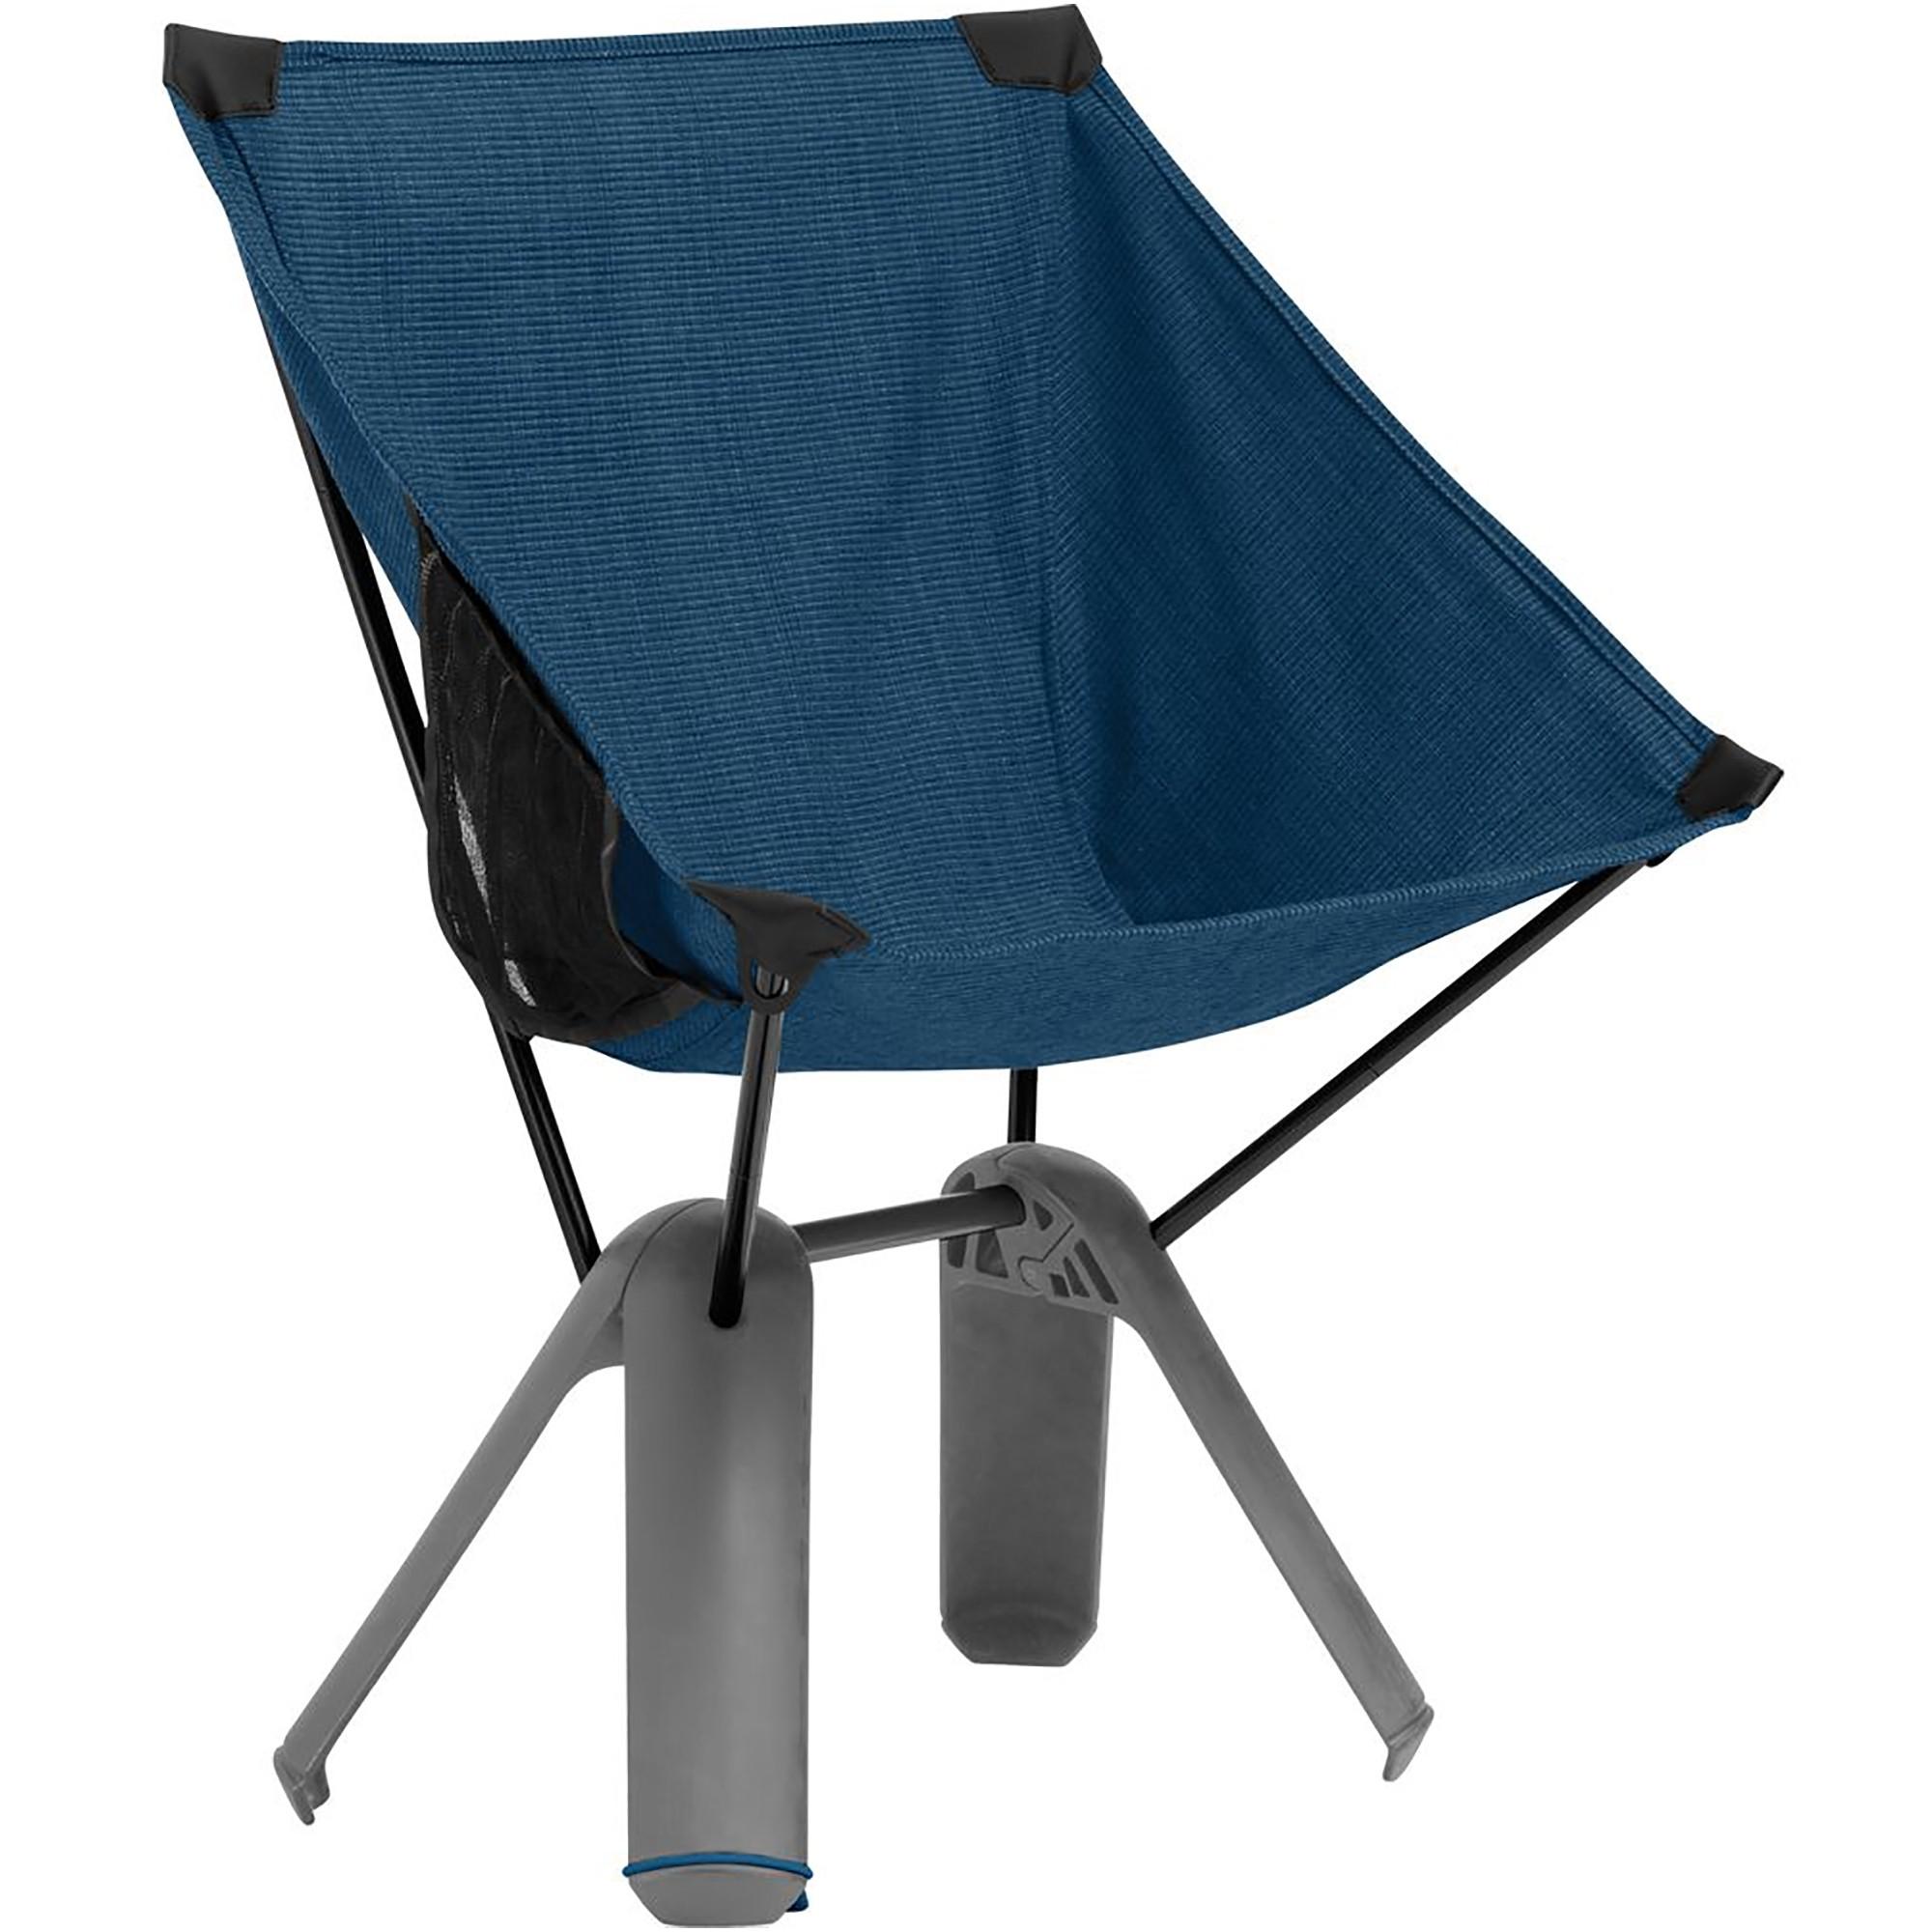 Therm-a-Rest Quadra Camping Chair - Poseidon